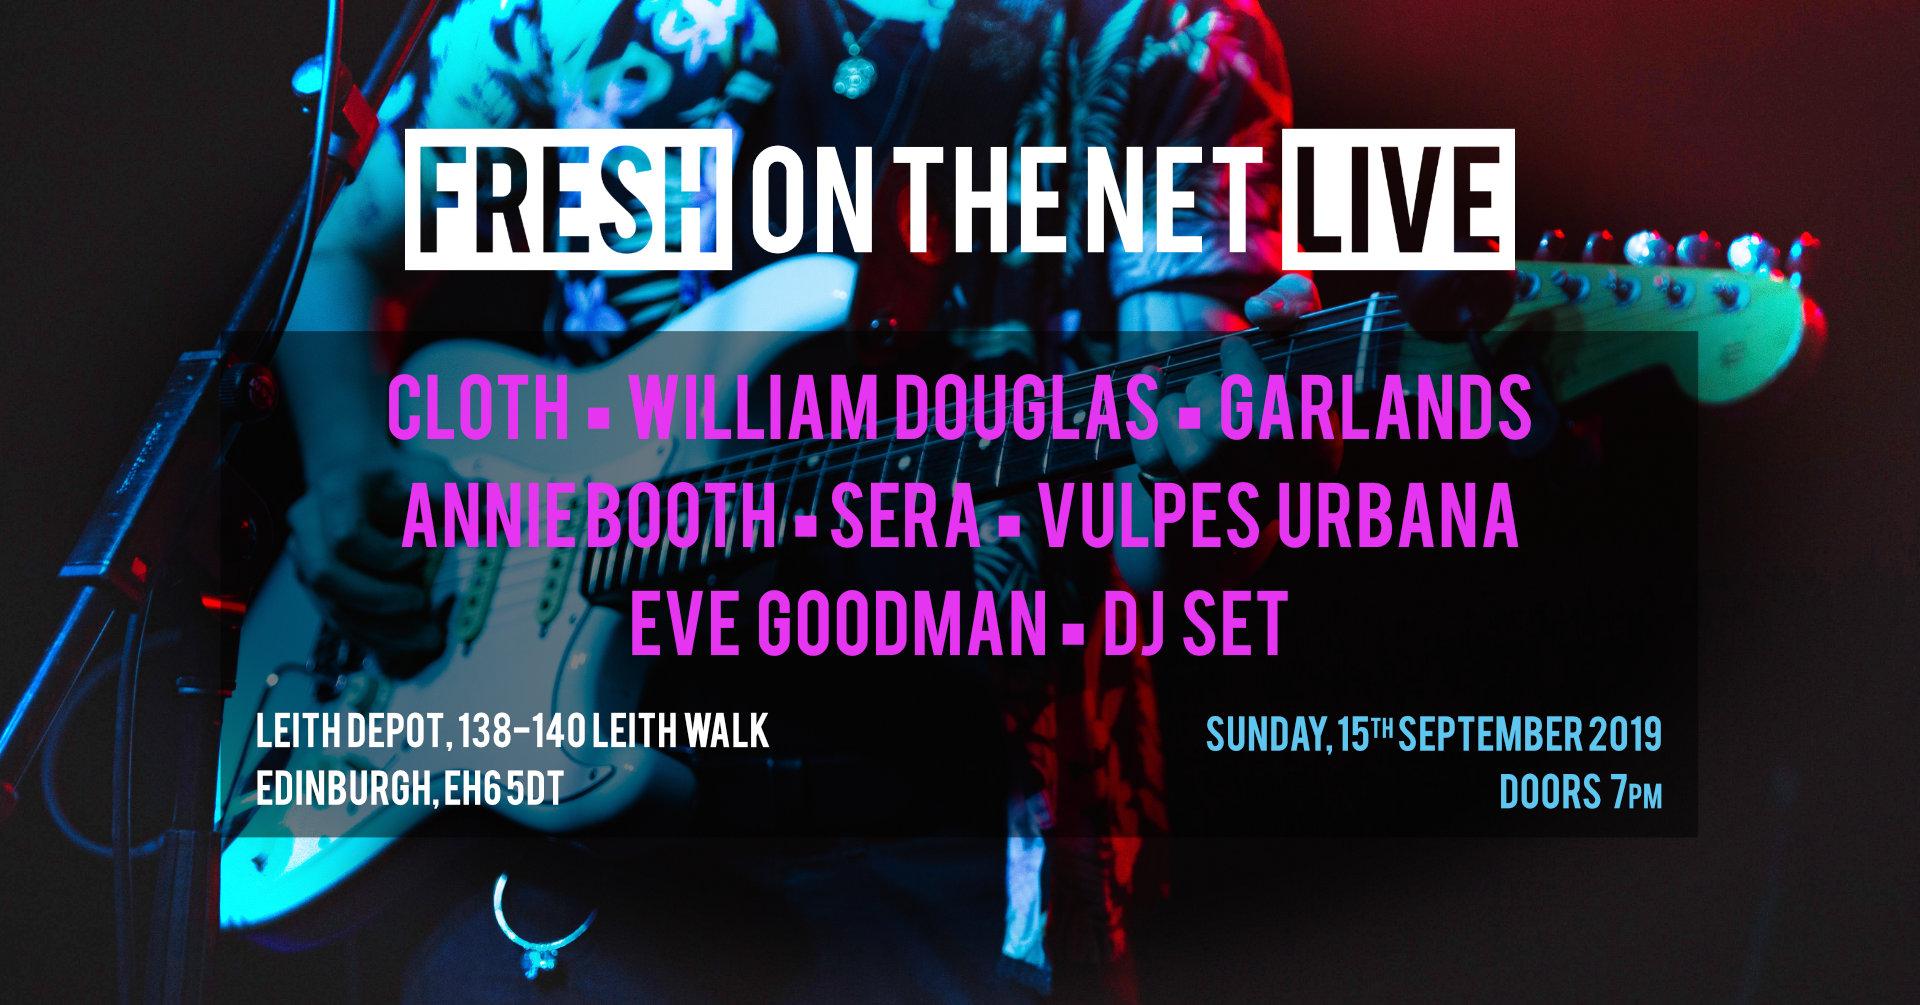 FOTN Live Edinburgh